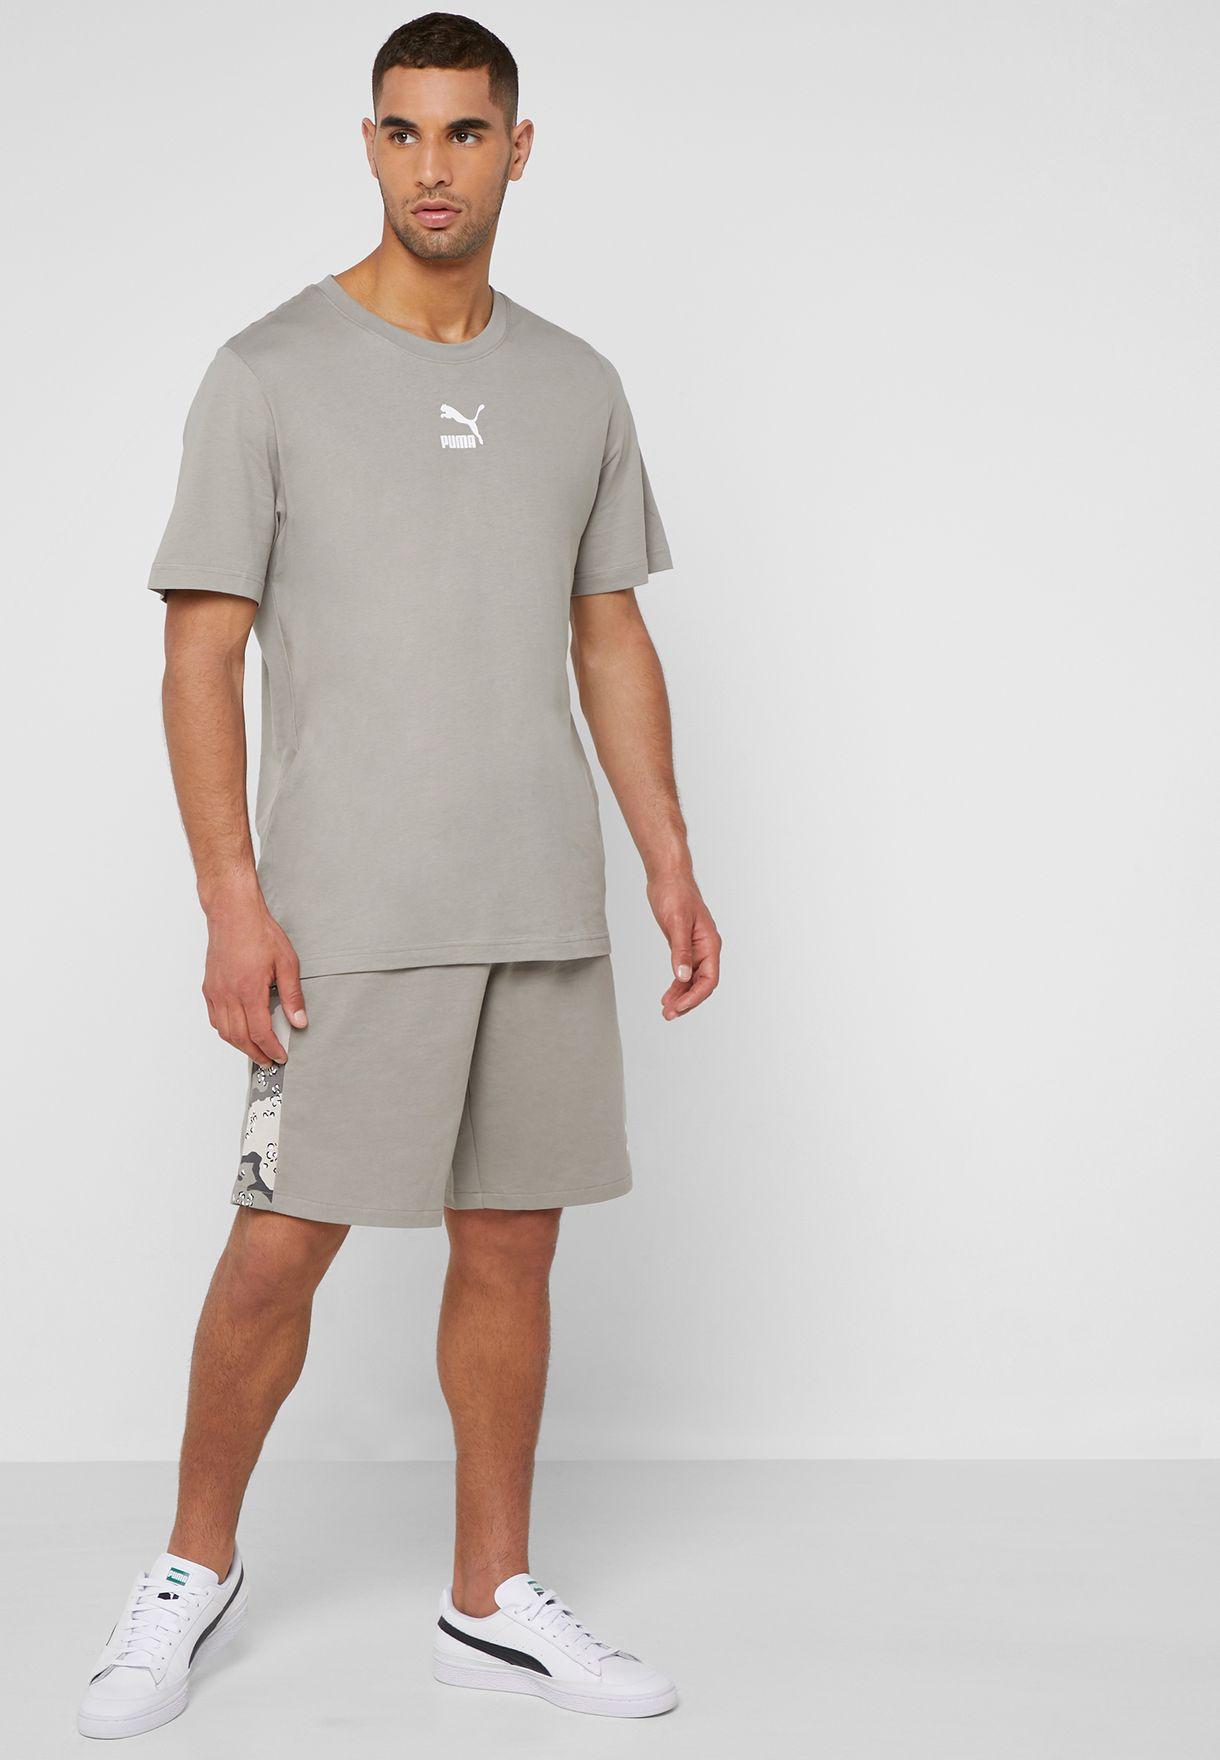 Wild Pack Shorts